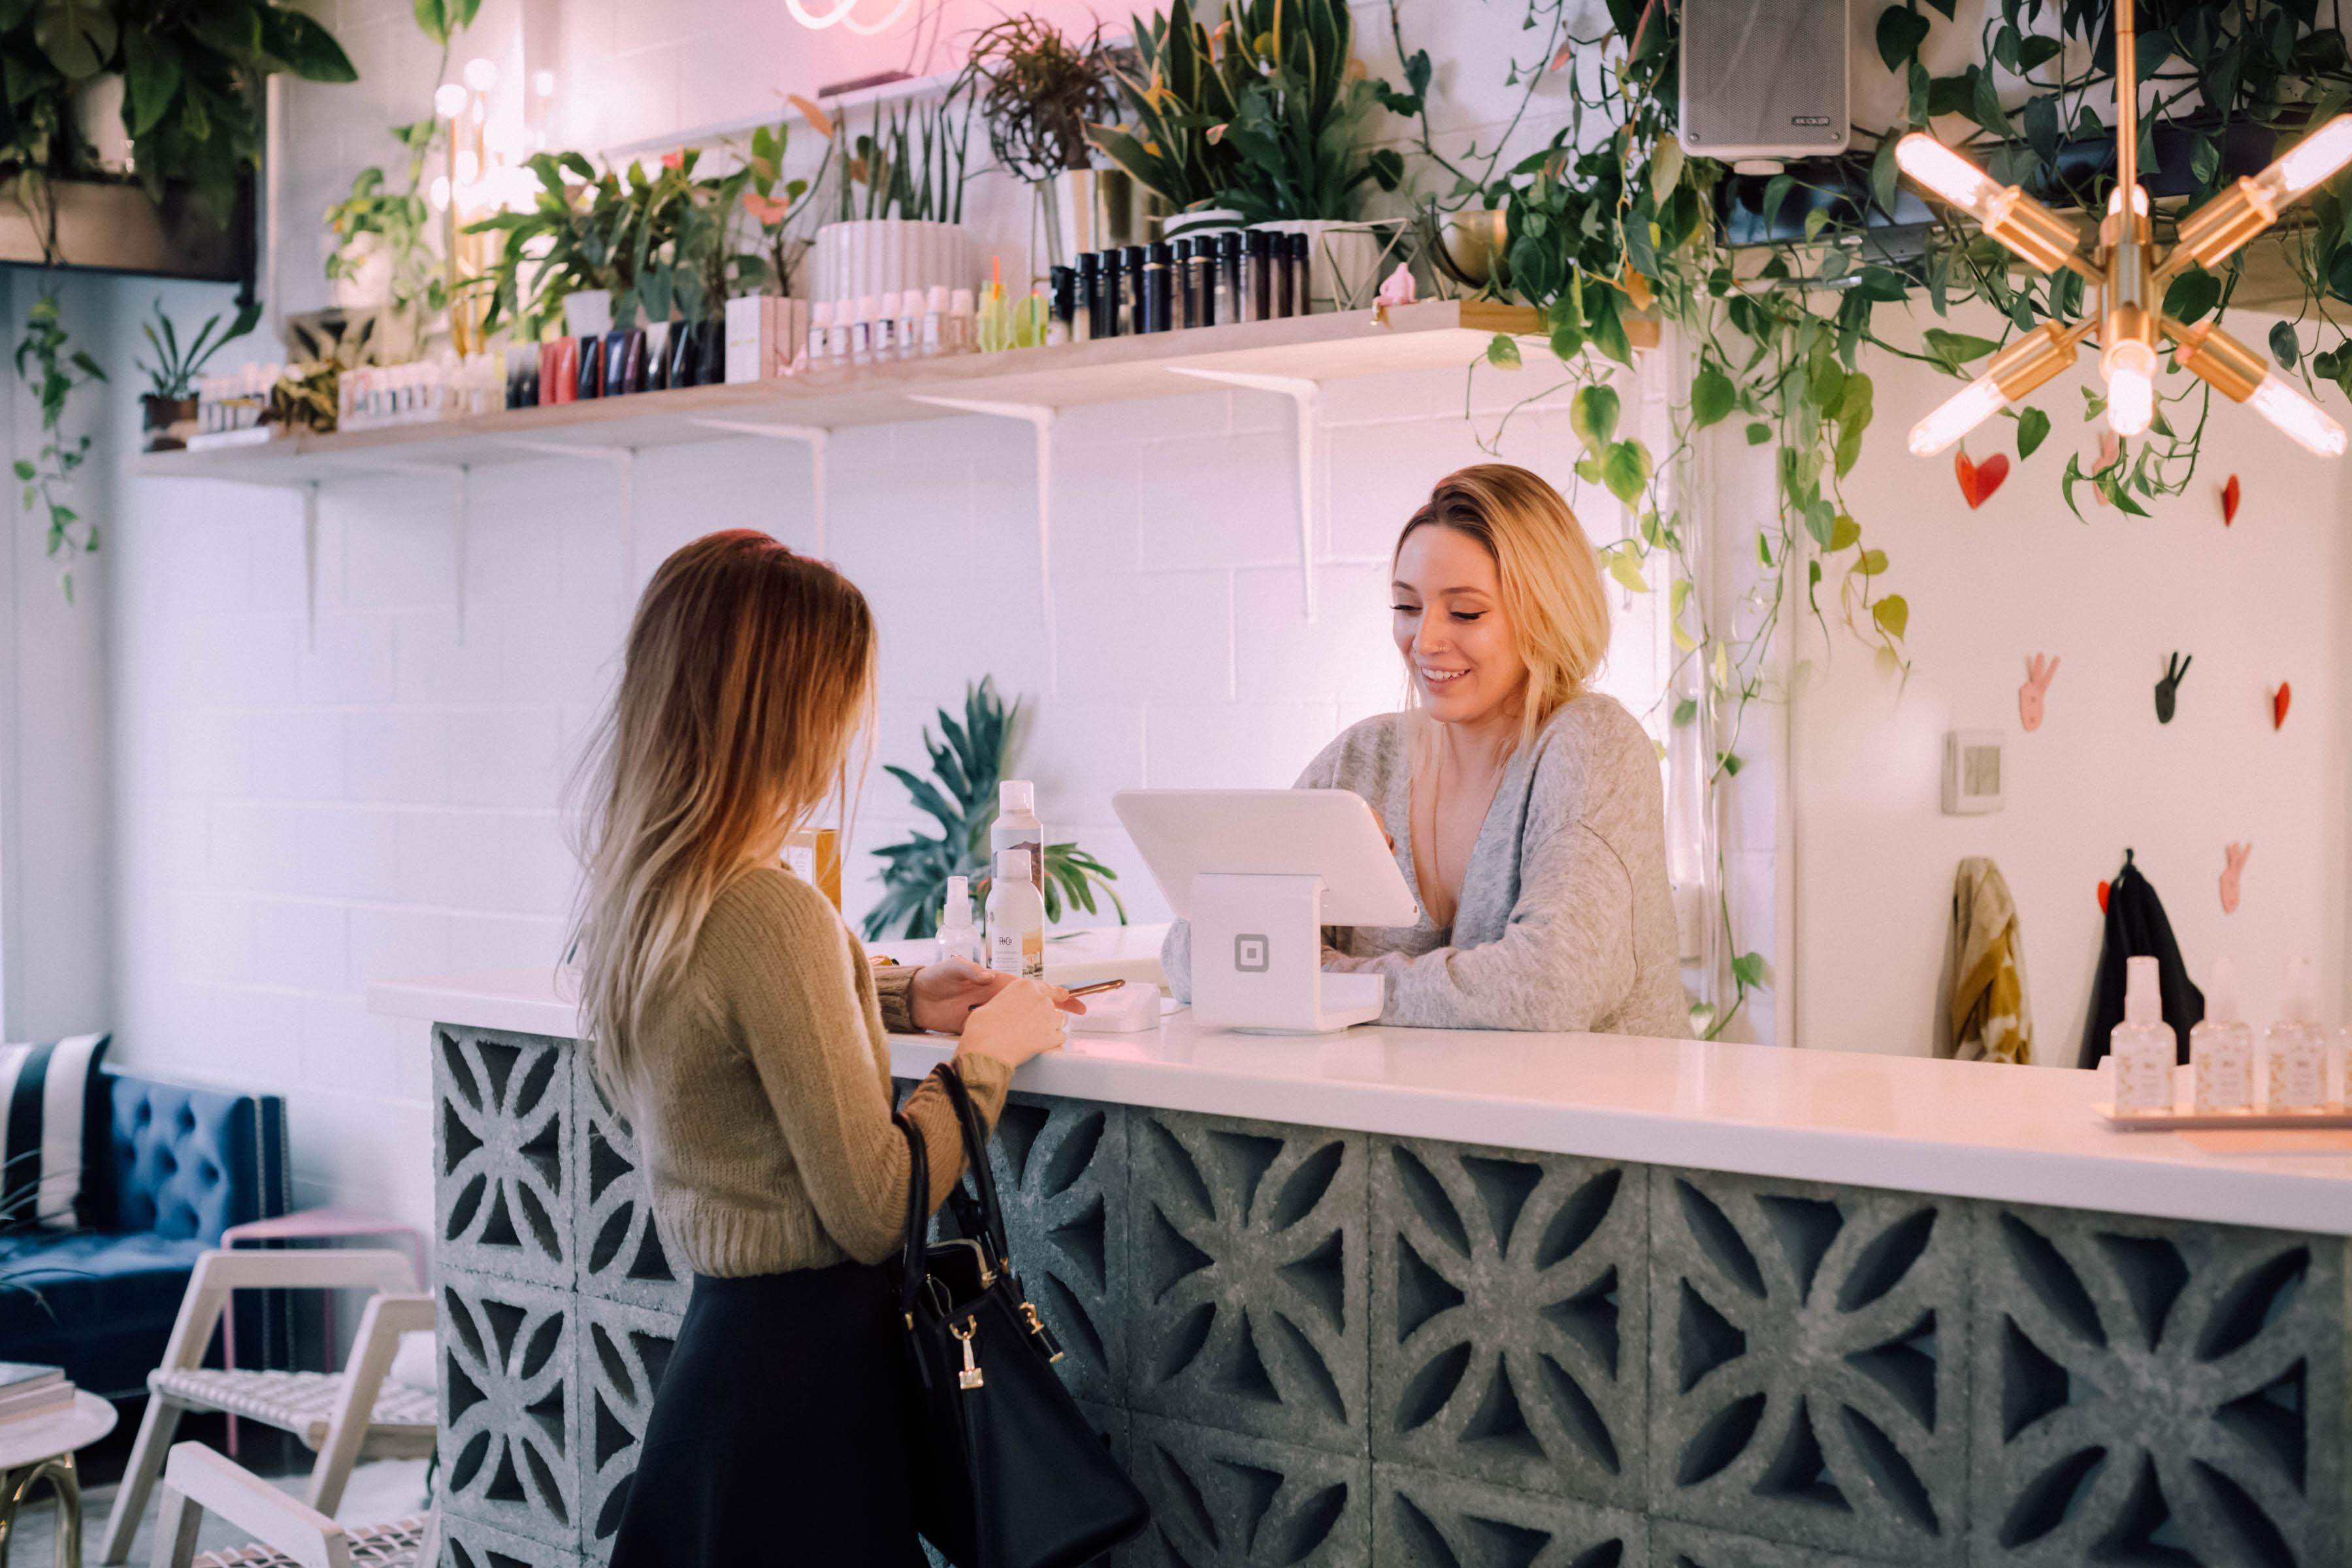 Saiba mais sobre os tipos de empreendedorismo